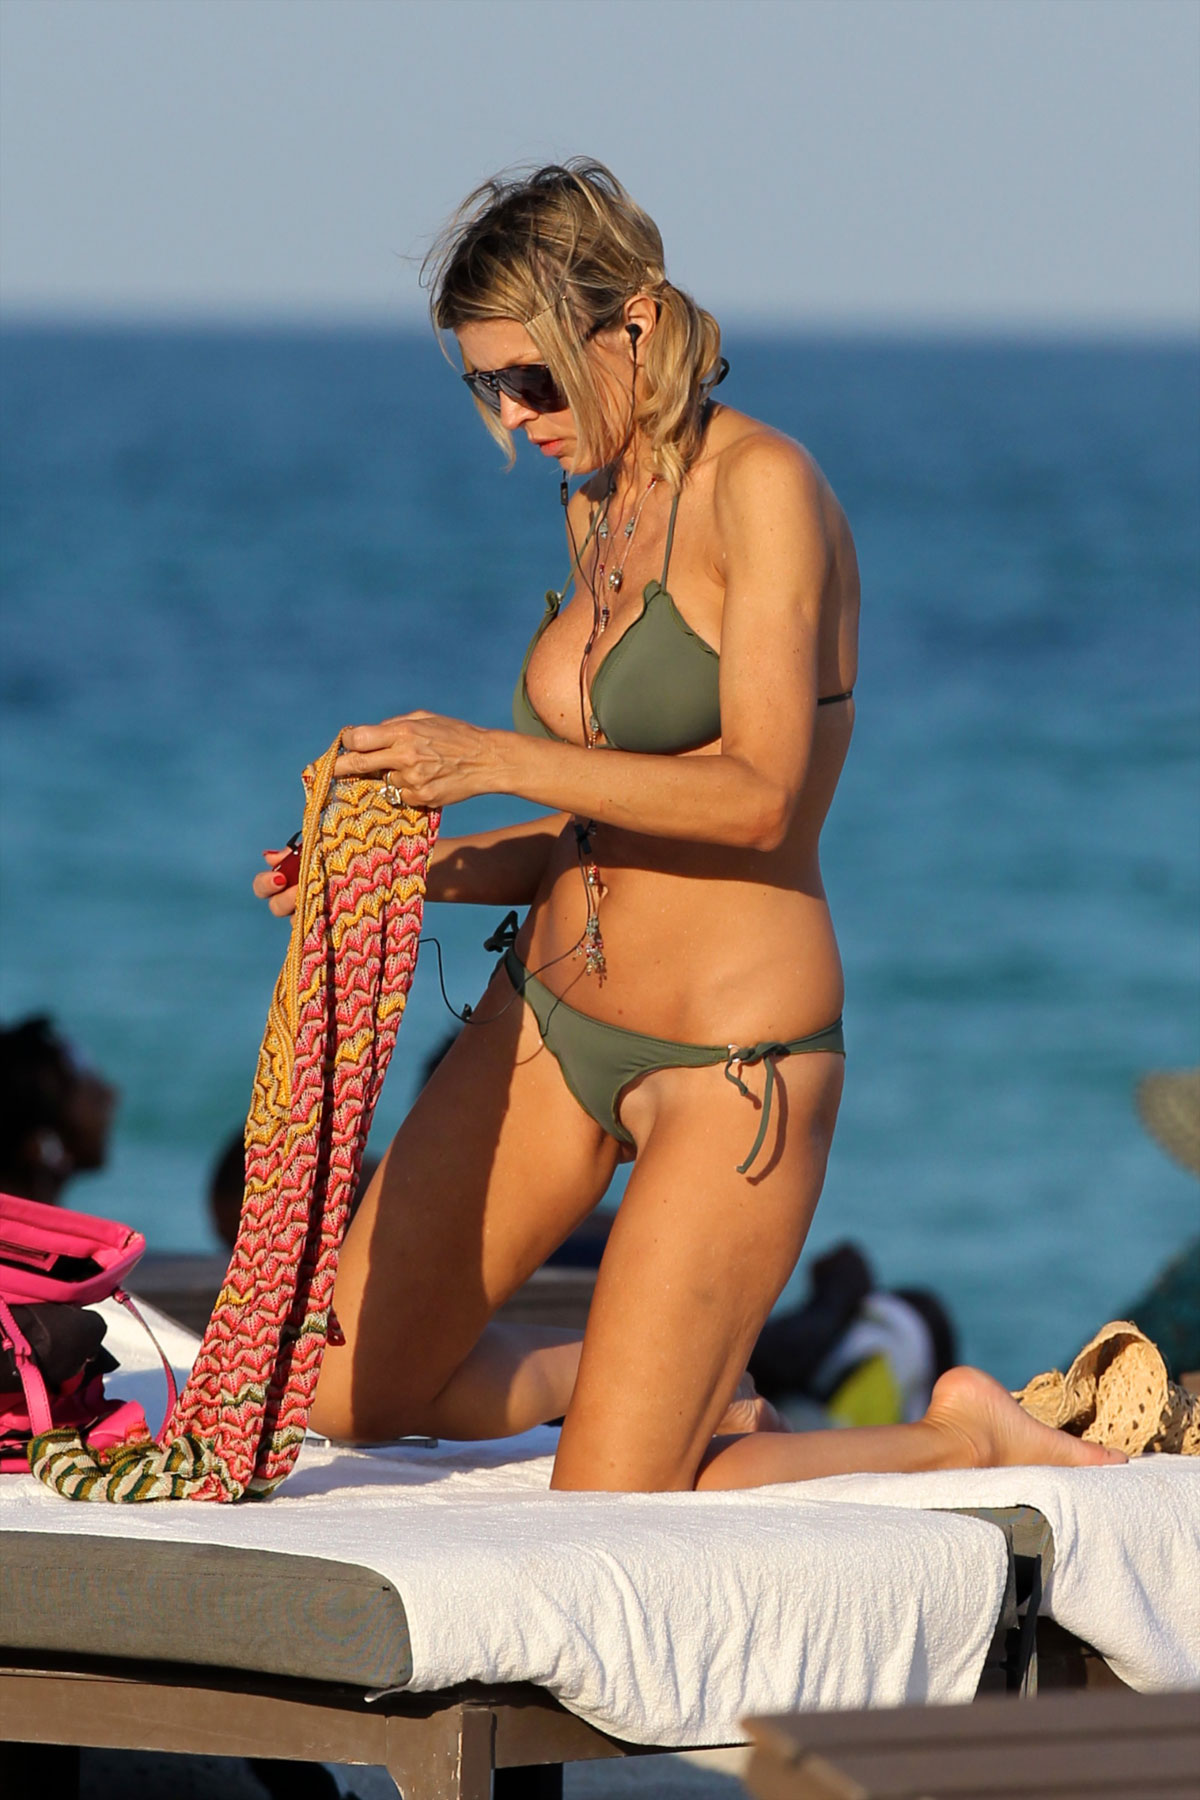 Bikini beach pussy